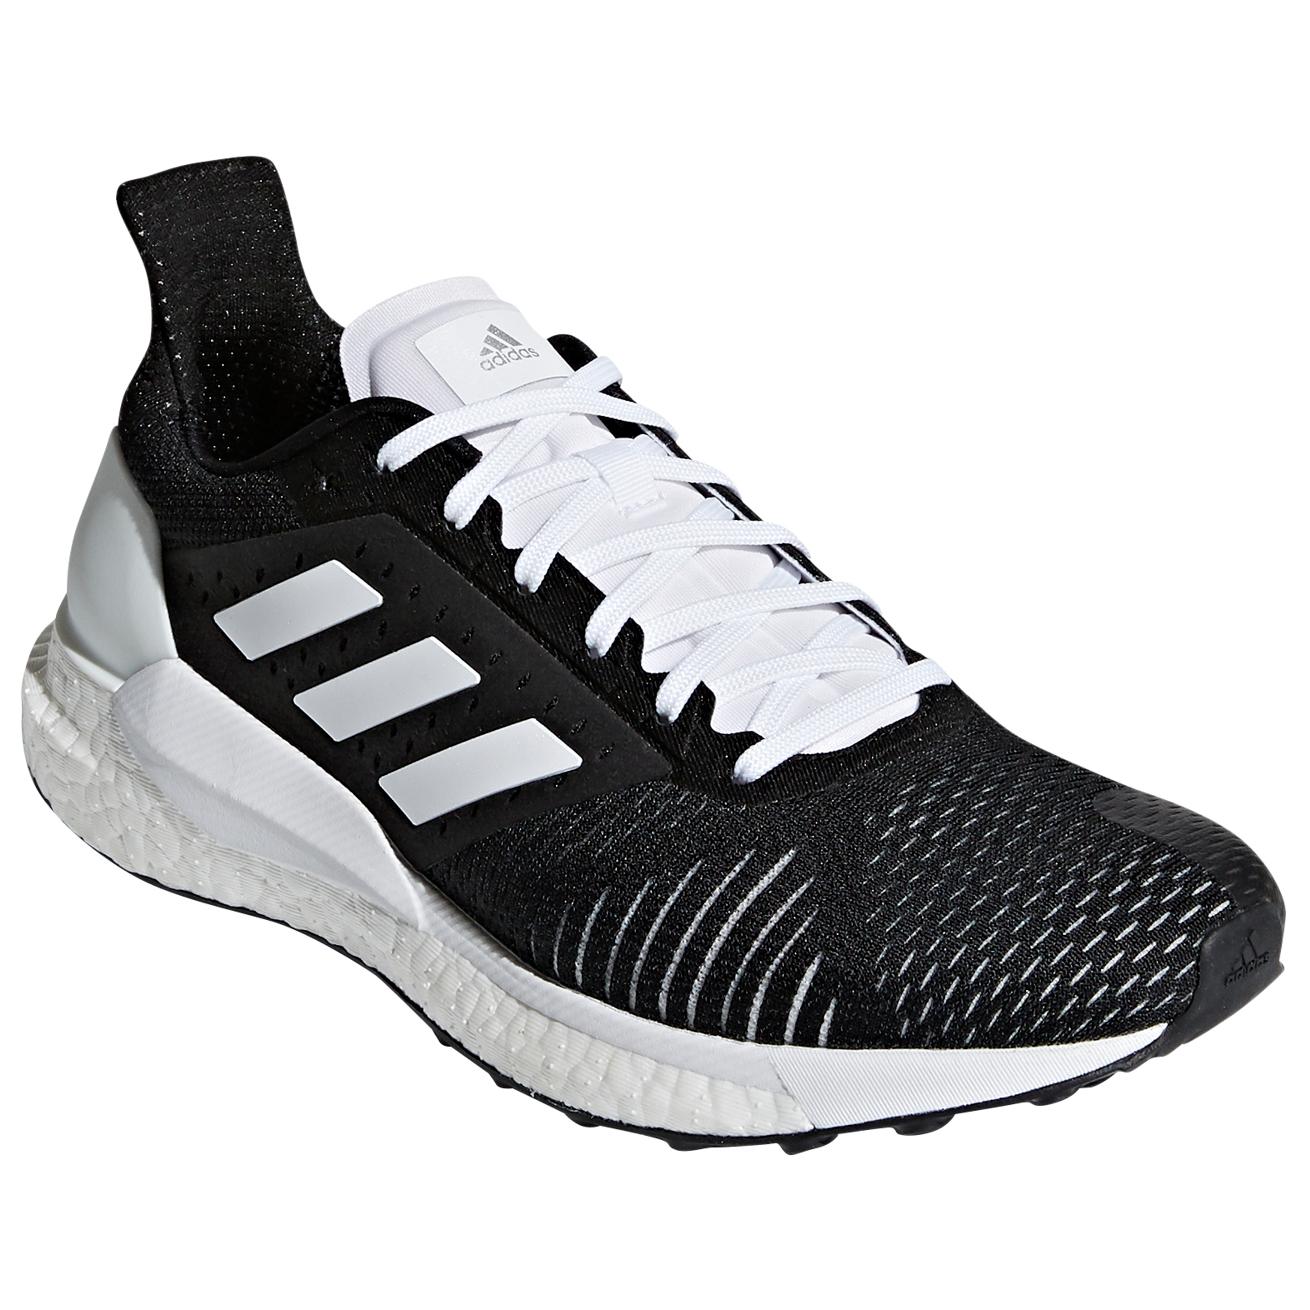 adidas Women's Solar Glide ST Runningschoenen Core Black Core Black Ftwr White | 4,5 (UK)